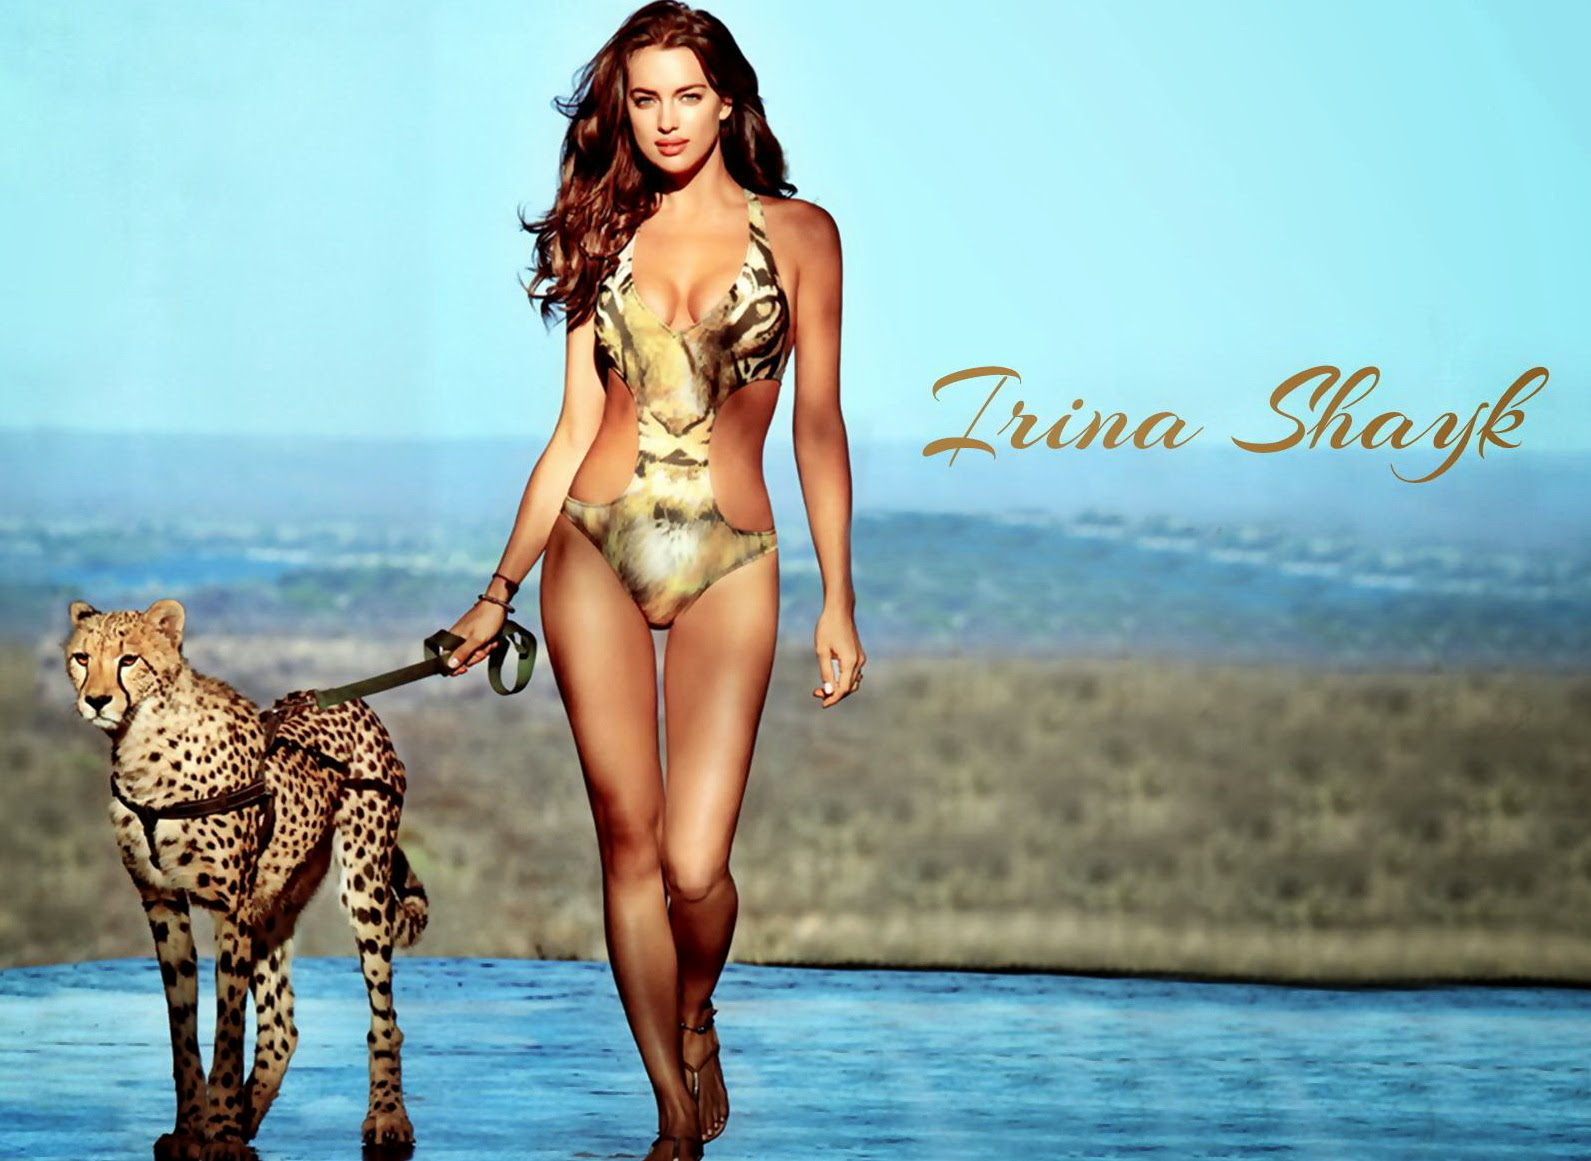 Irina shayk hd wallpapers most beautiful places in the - Hd bikini wallpaper download ...